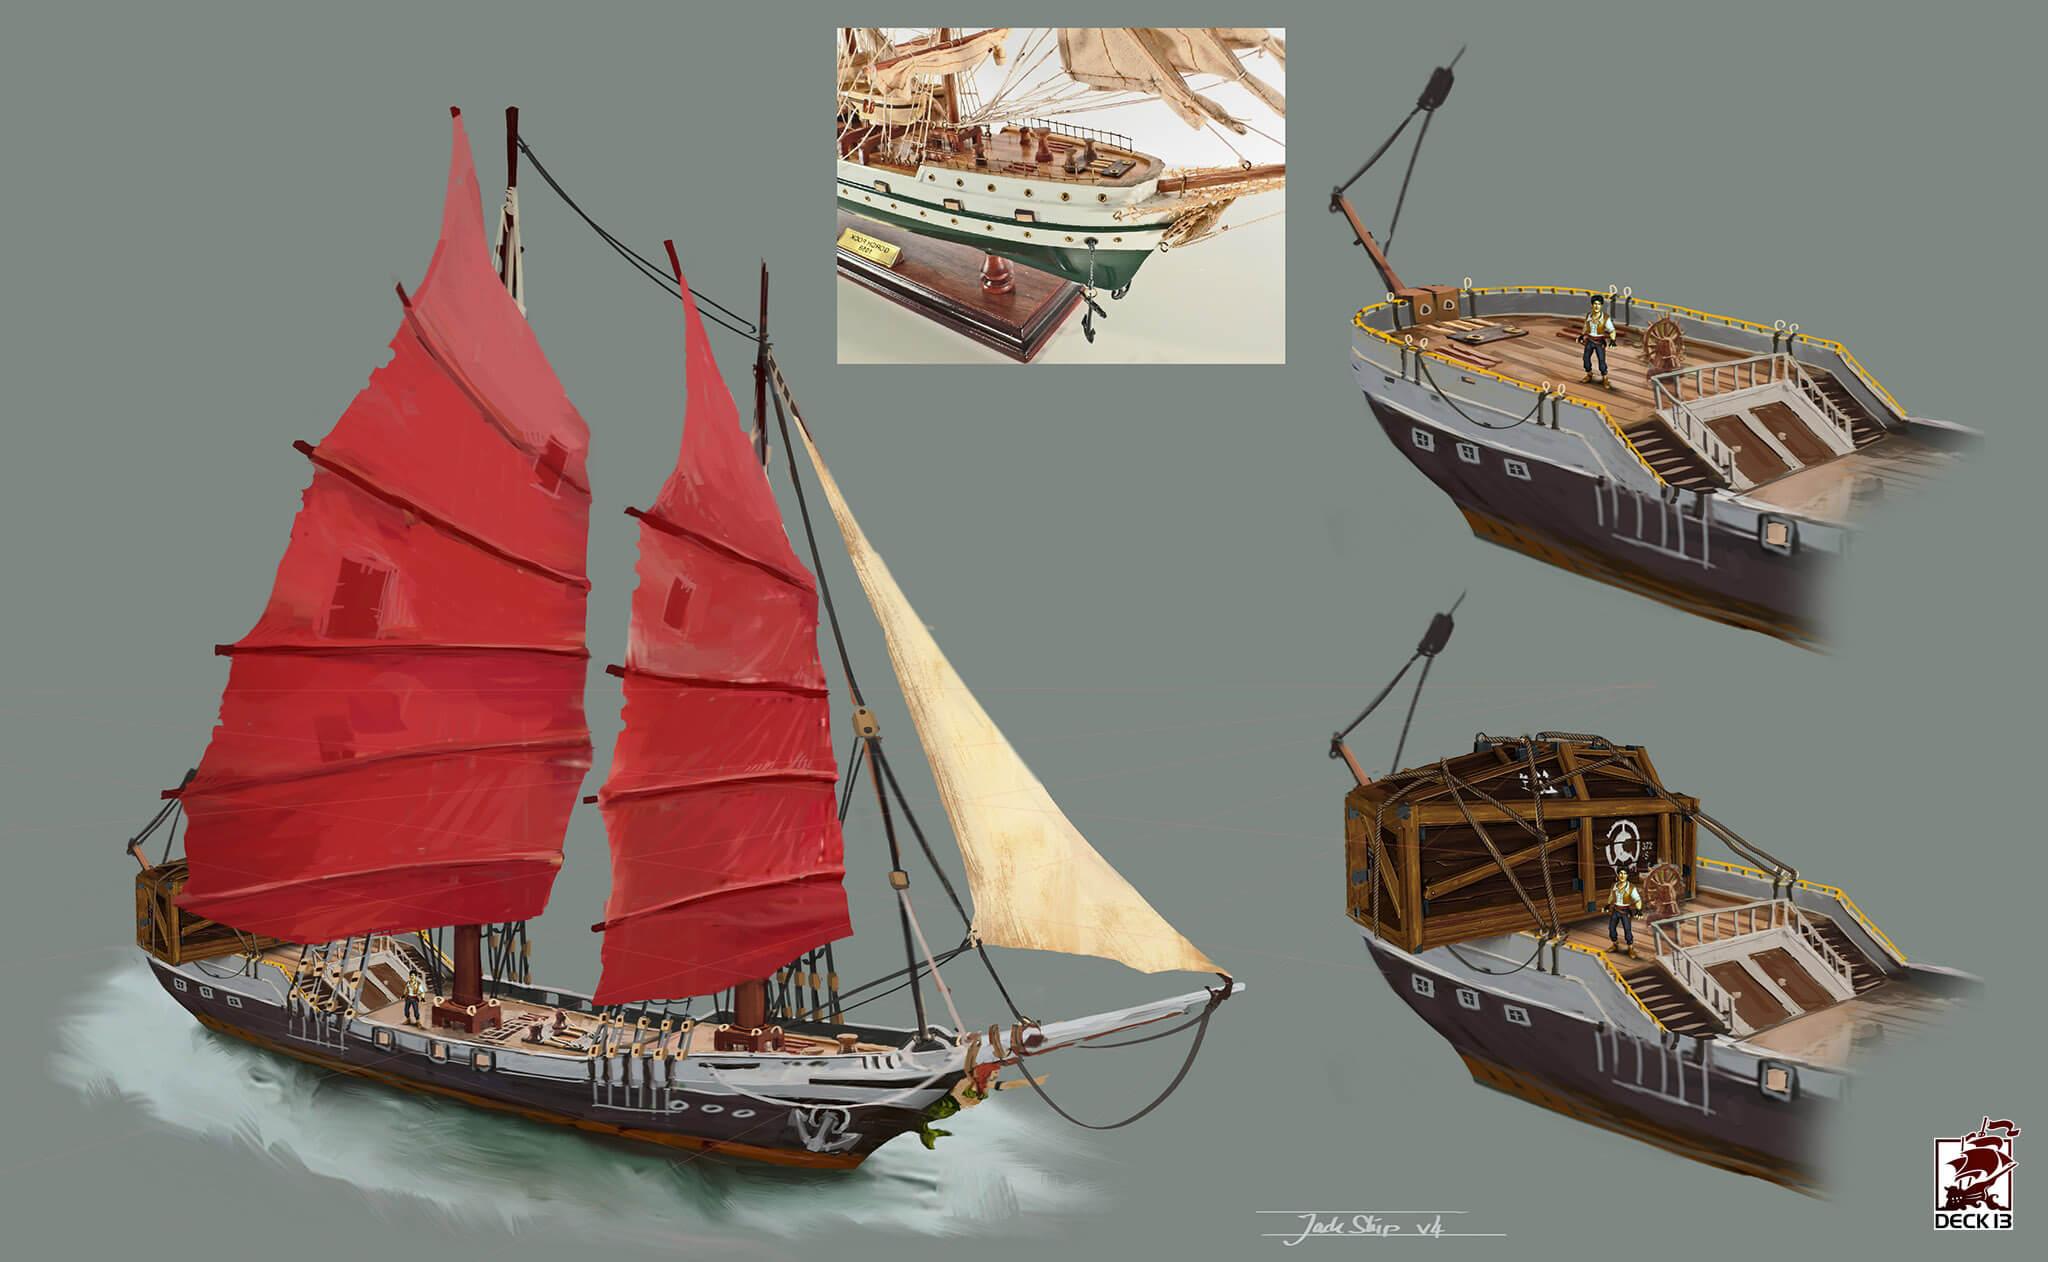 jack-keane-2-deck13-concept-art-felix-botho-haas-jack_ship_004